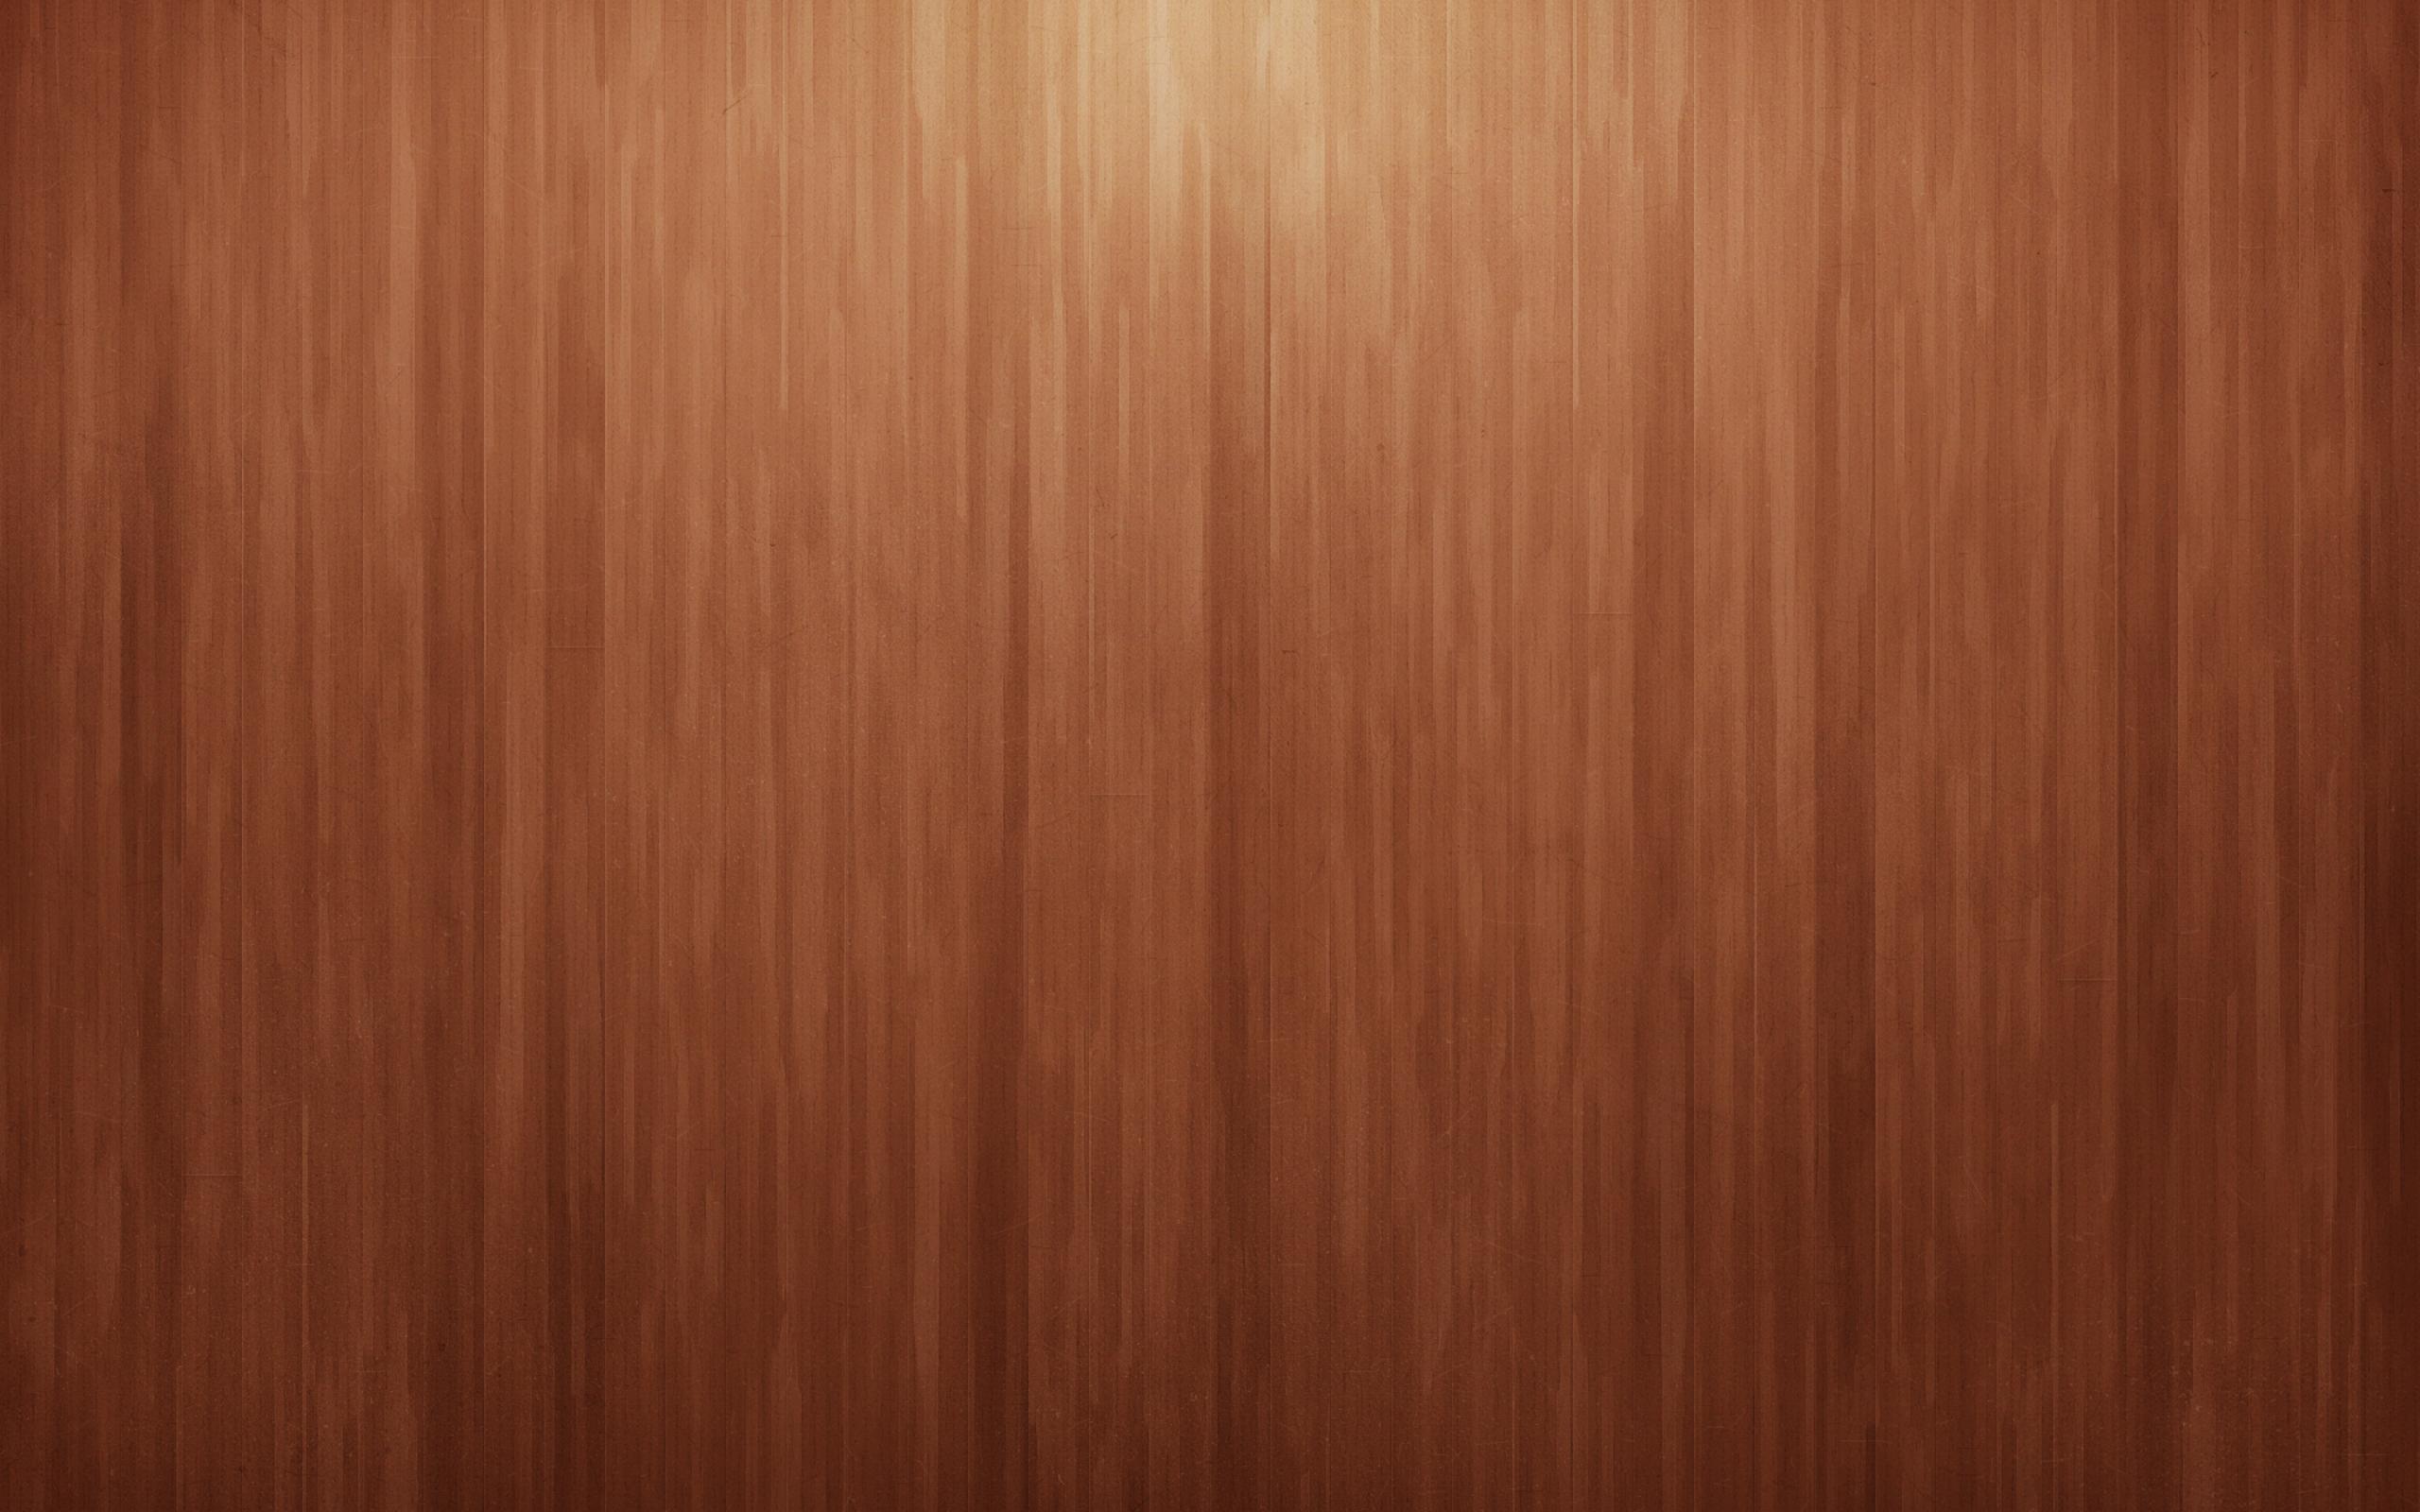 Wood Texture Wallpaper Wood Pattern Wallpaper Wood Wallpaper Picture On Wood